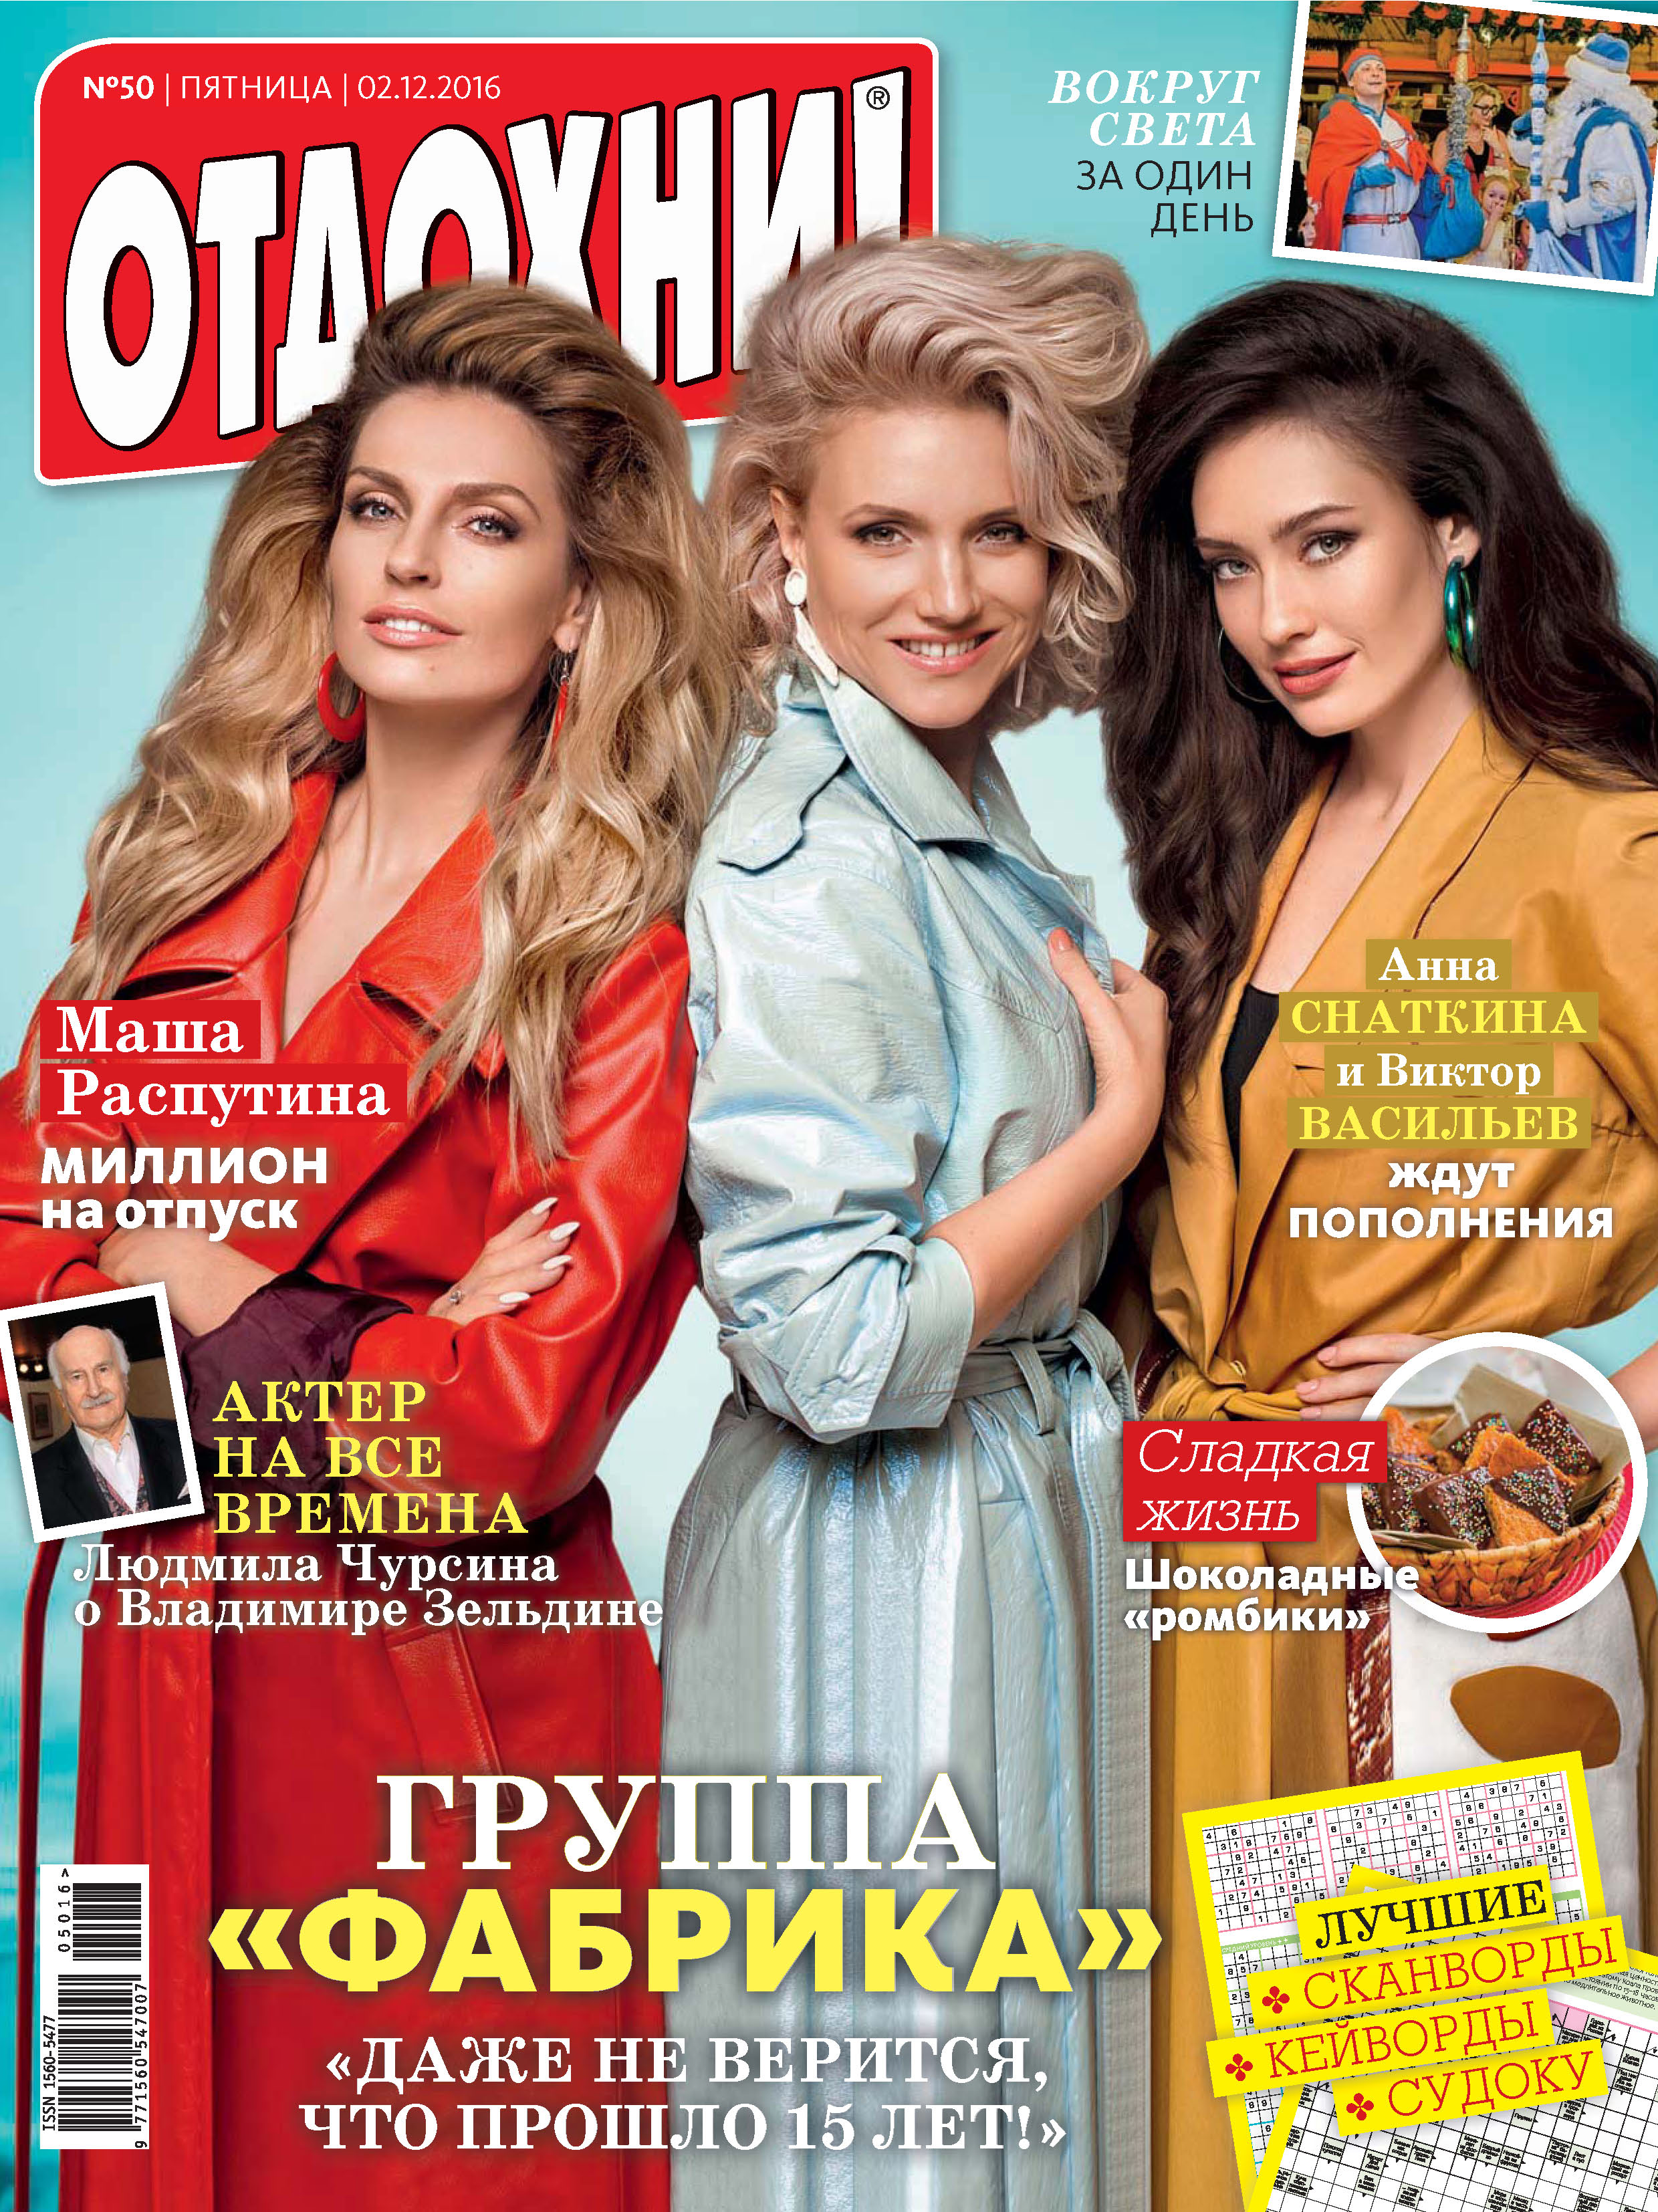 ИД «Бурда» Журнал «Отдохни!» №50/2016 ид бурда журнал отдохни 39 2016